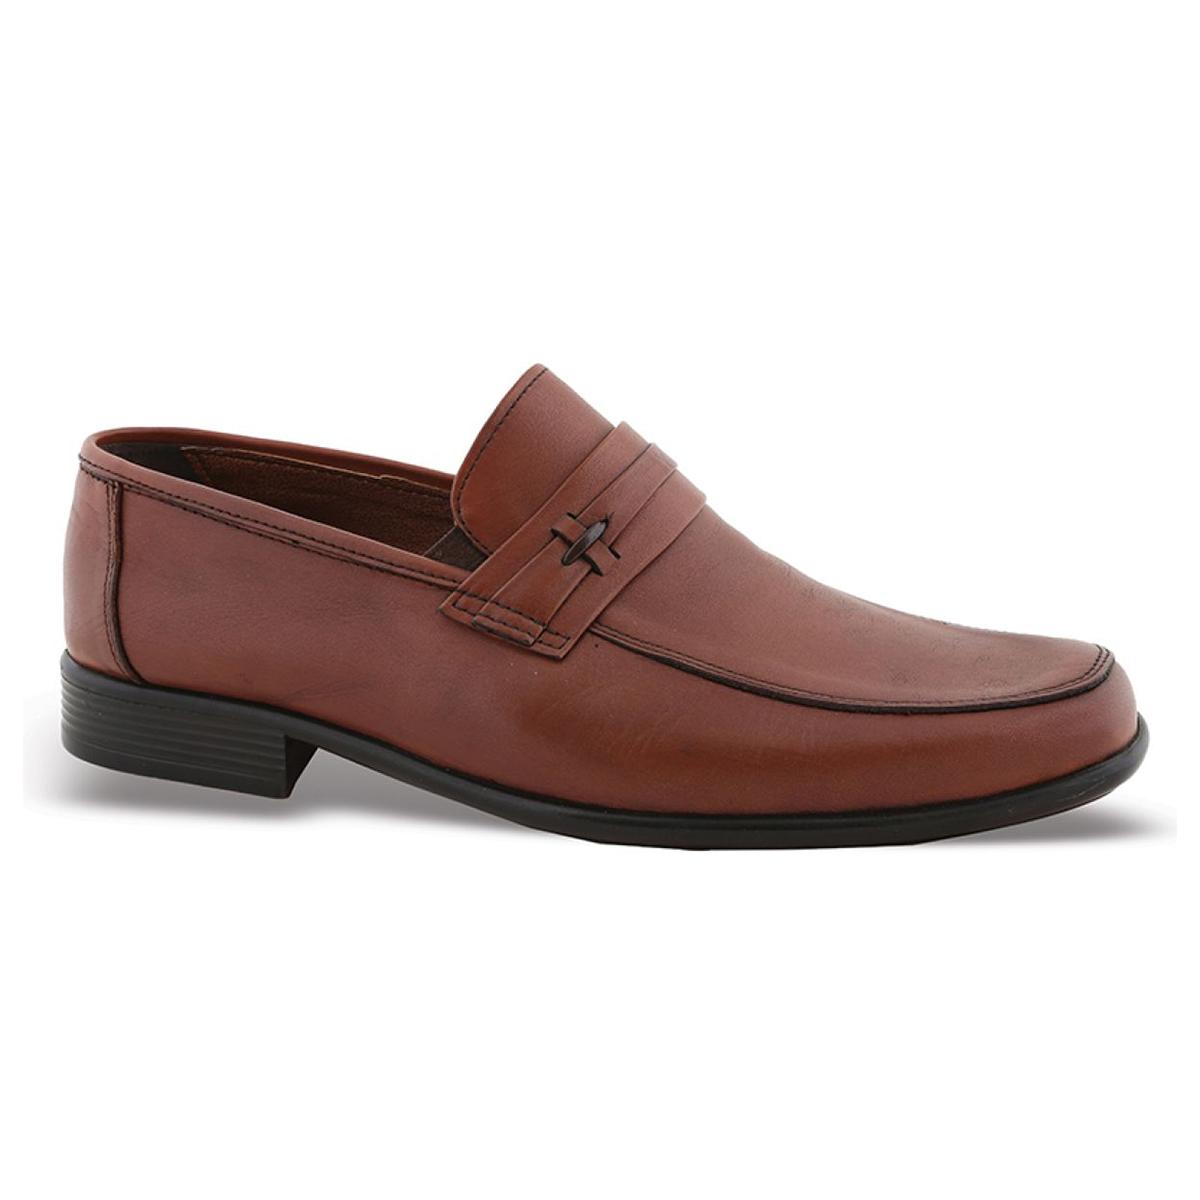 Casual ανδρικά παπούτσια Νο 402 - Ταμπά